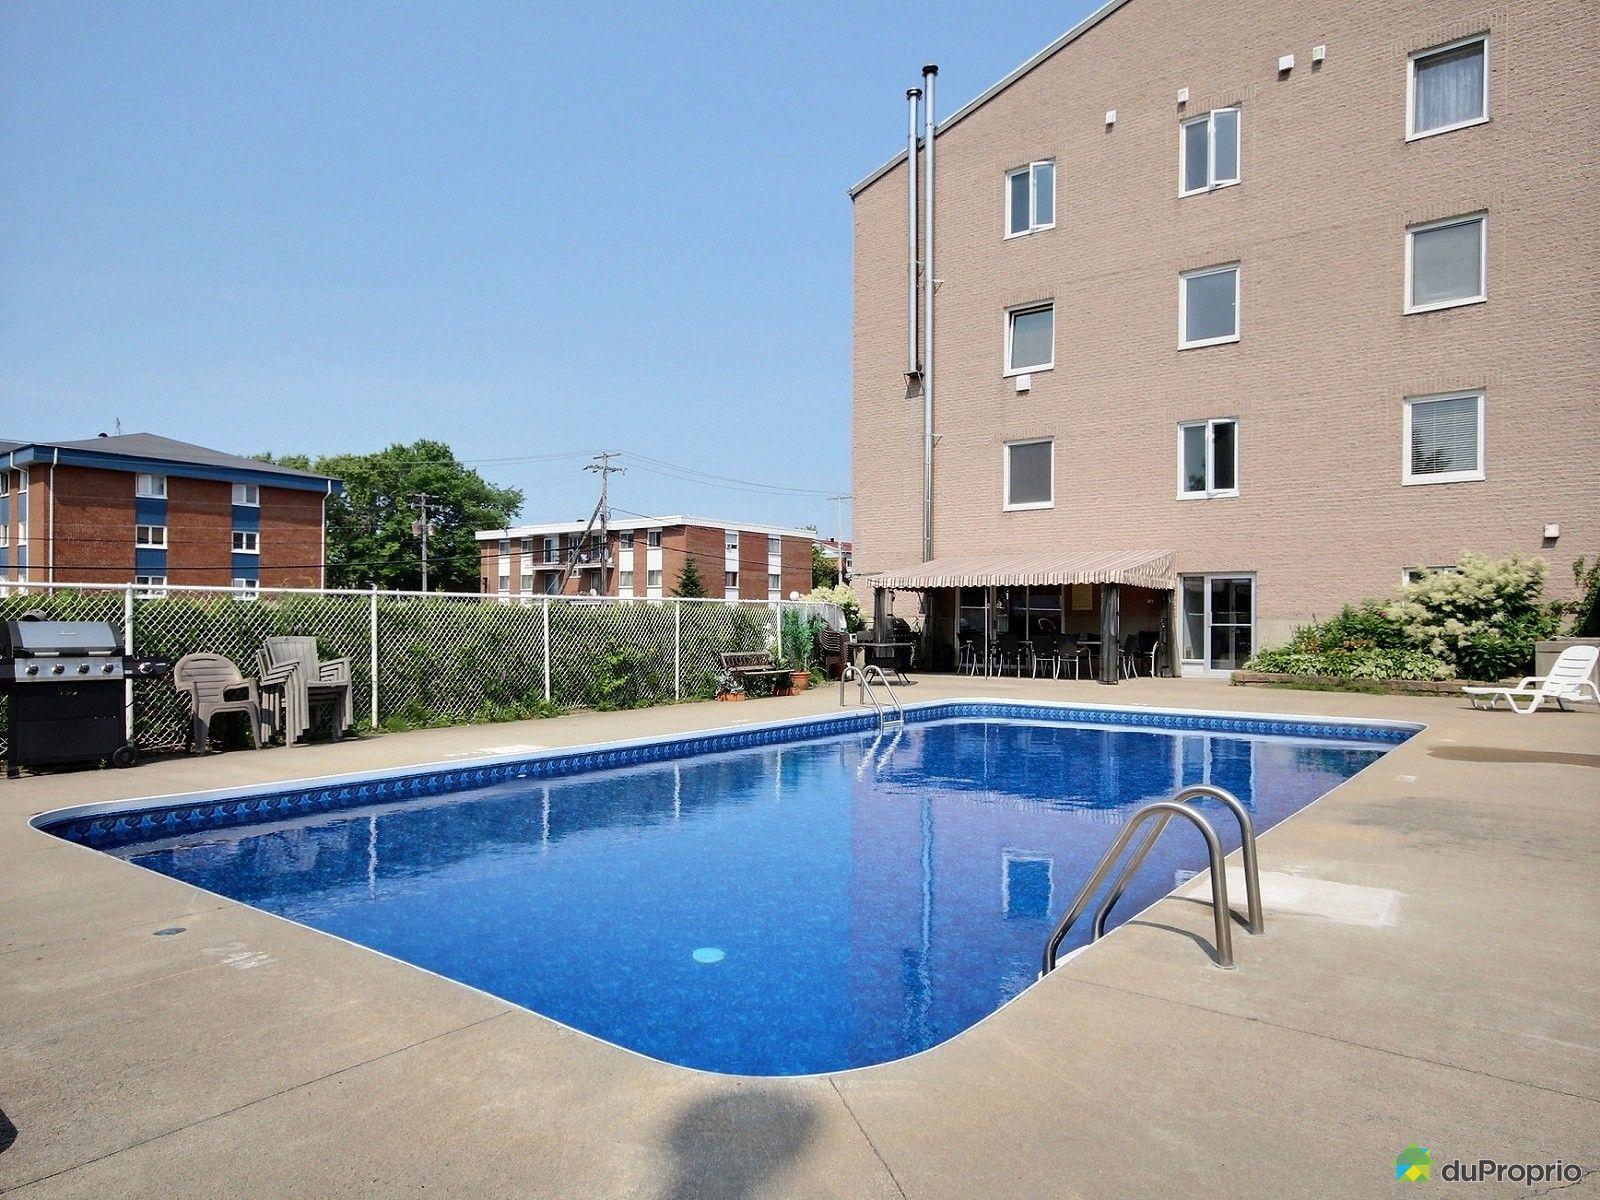 Condo vendre charlesbourg 409 4405 rue le monelier for Arpidrome charlesbourg piscine